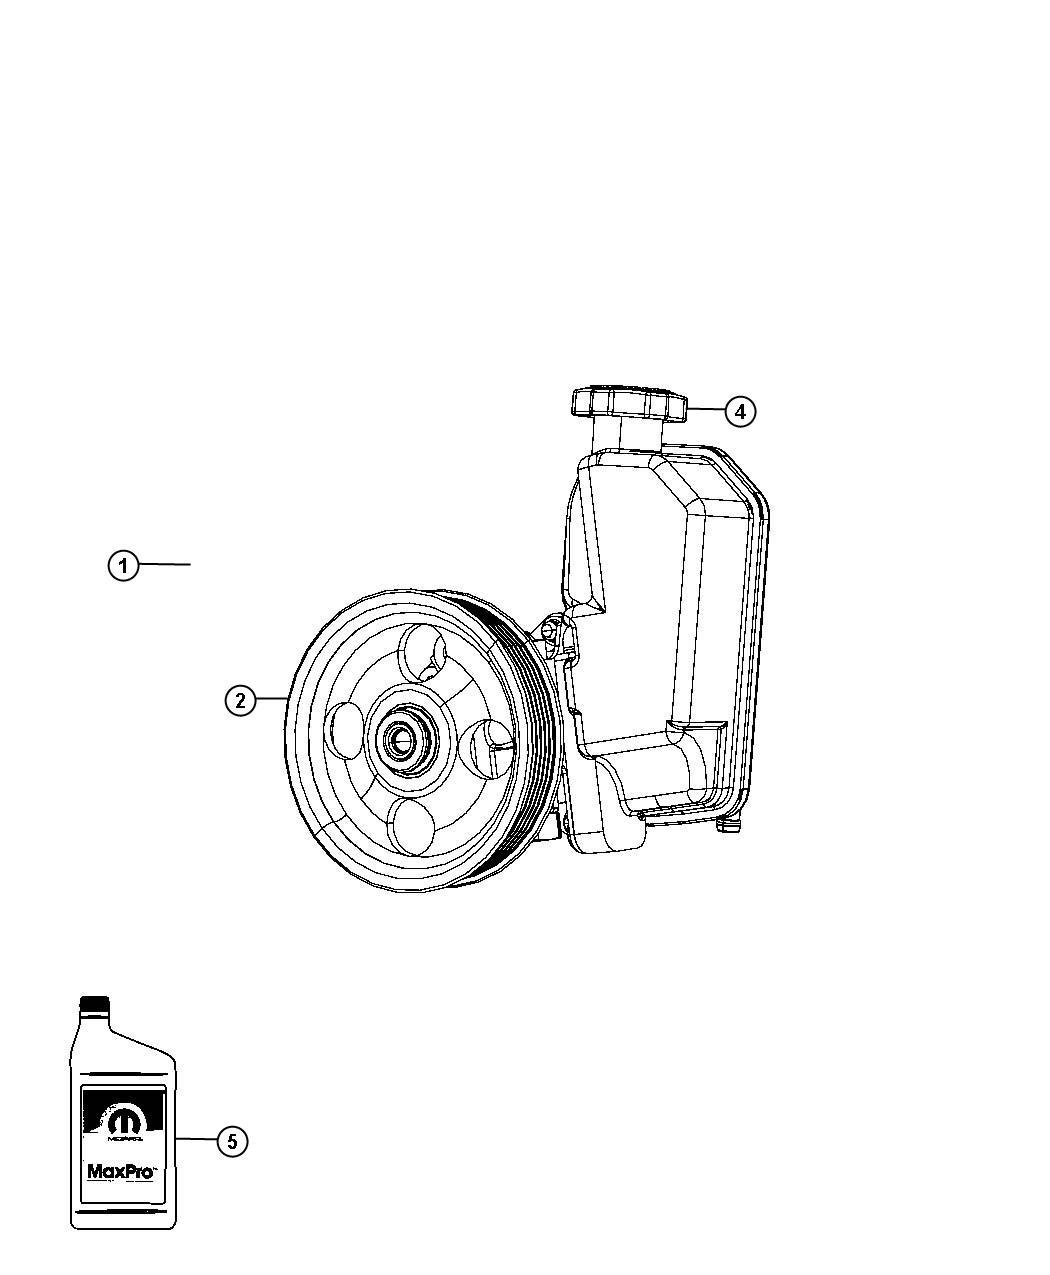 Dodge Nitro Pump Power Steering